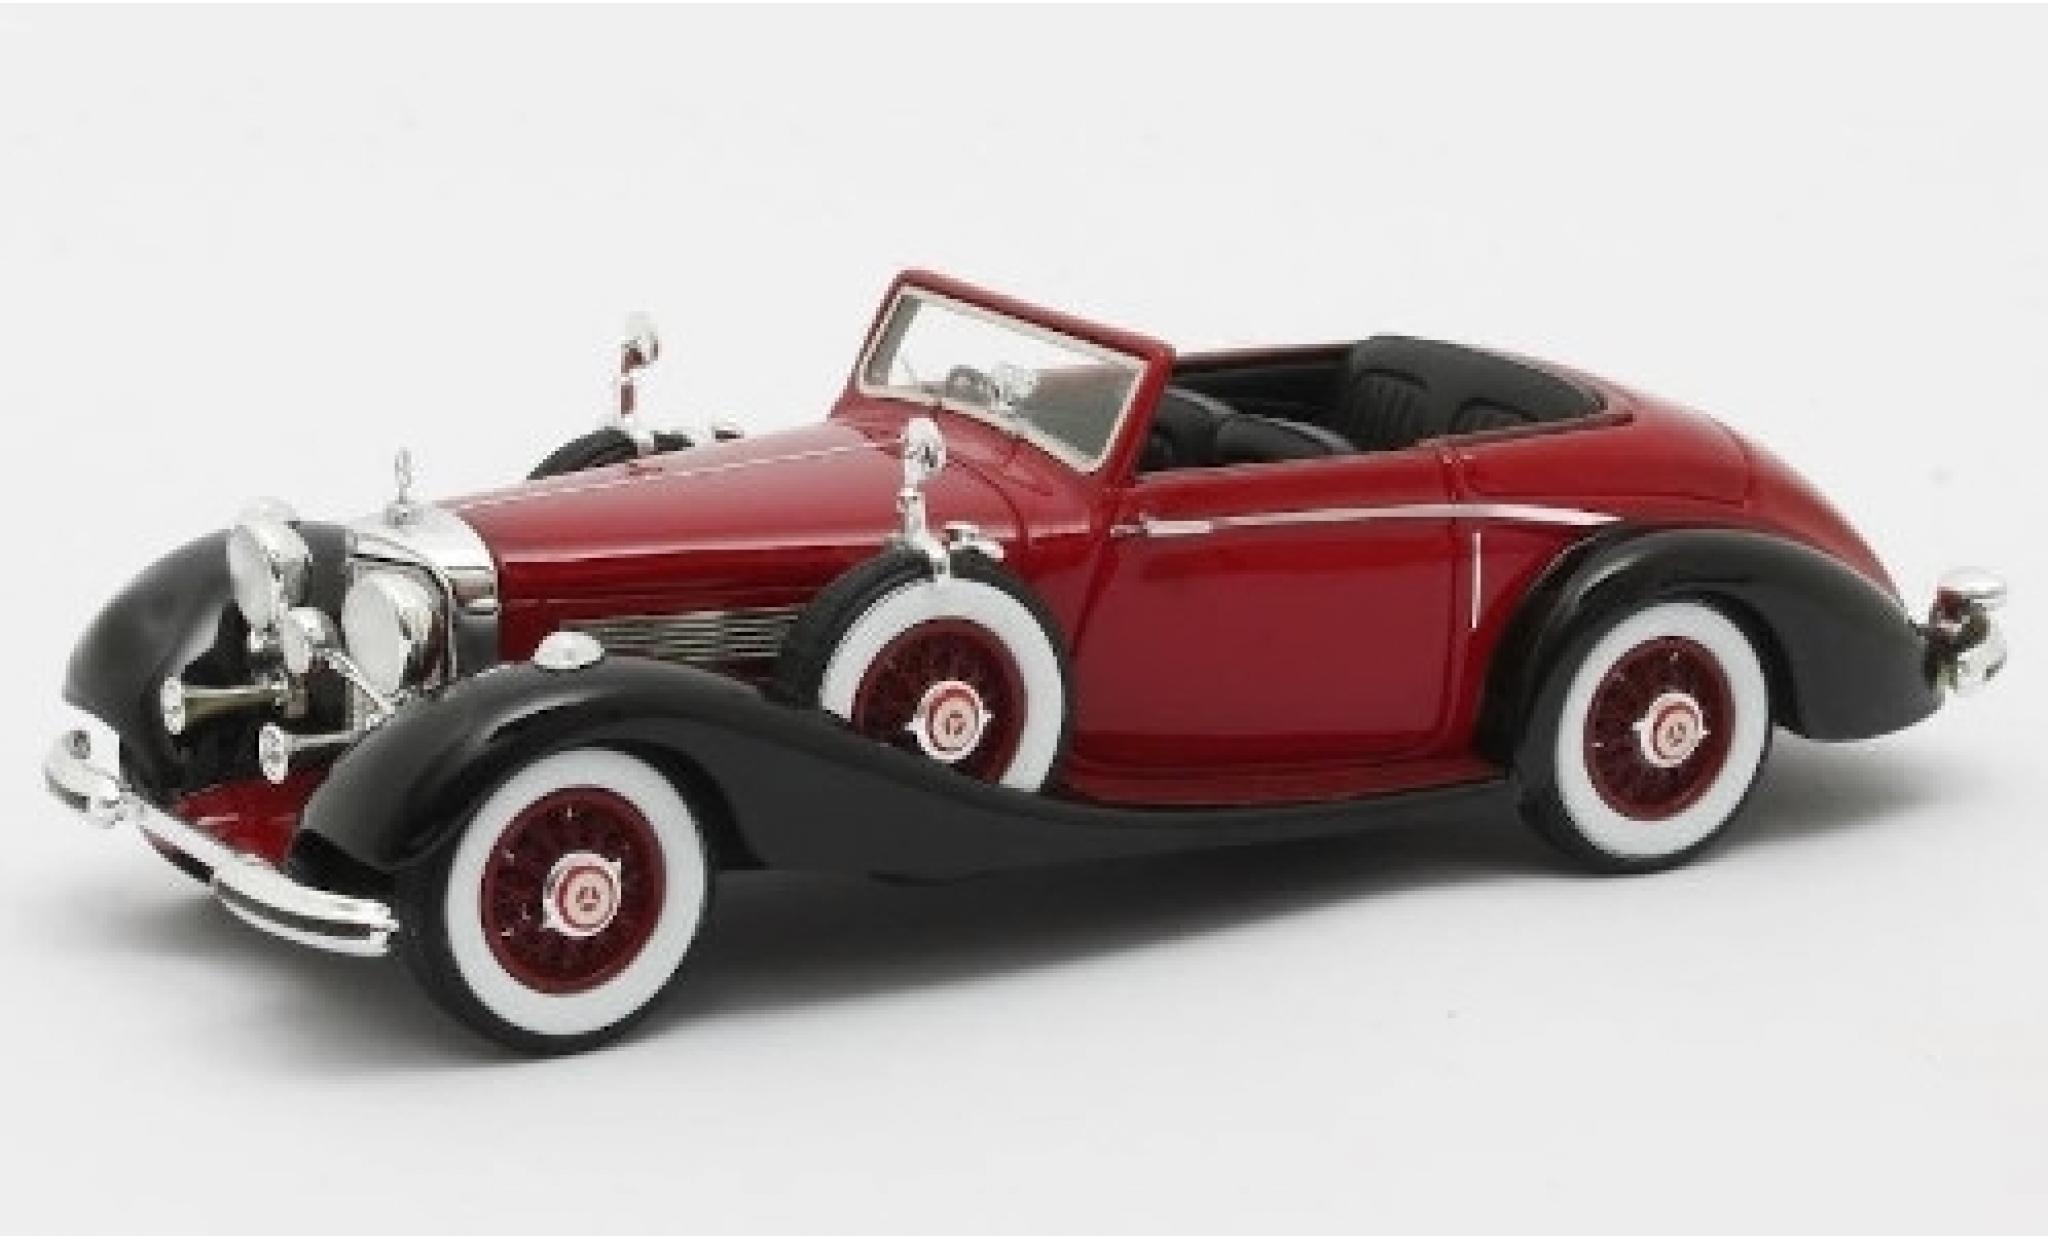 Mercedes 540 1/43 Matrix K Roadster Lancefield rouge/noire RHD 1938 No.169317